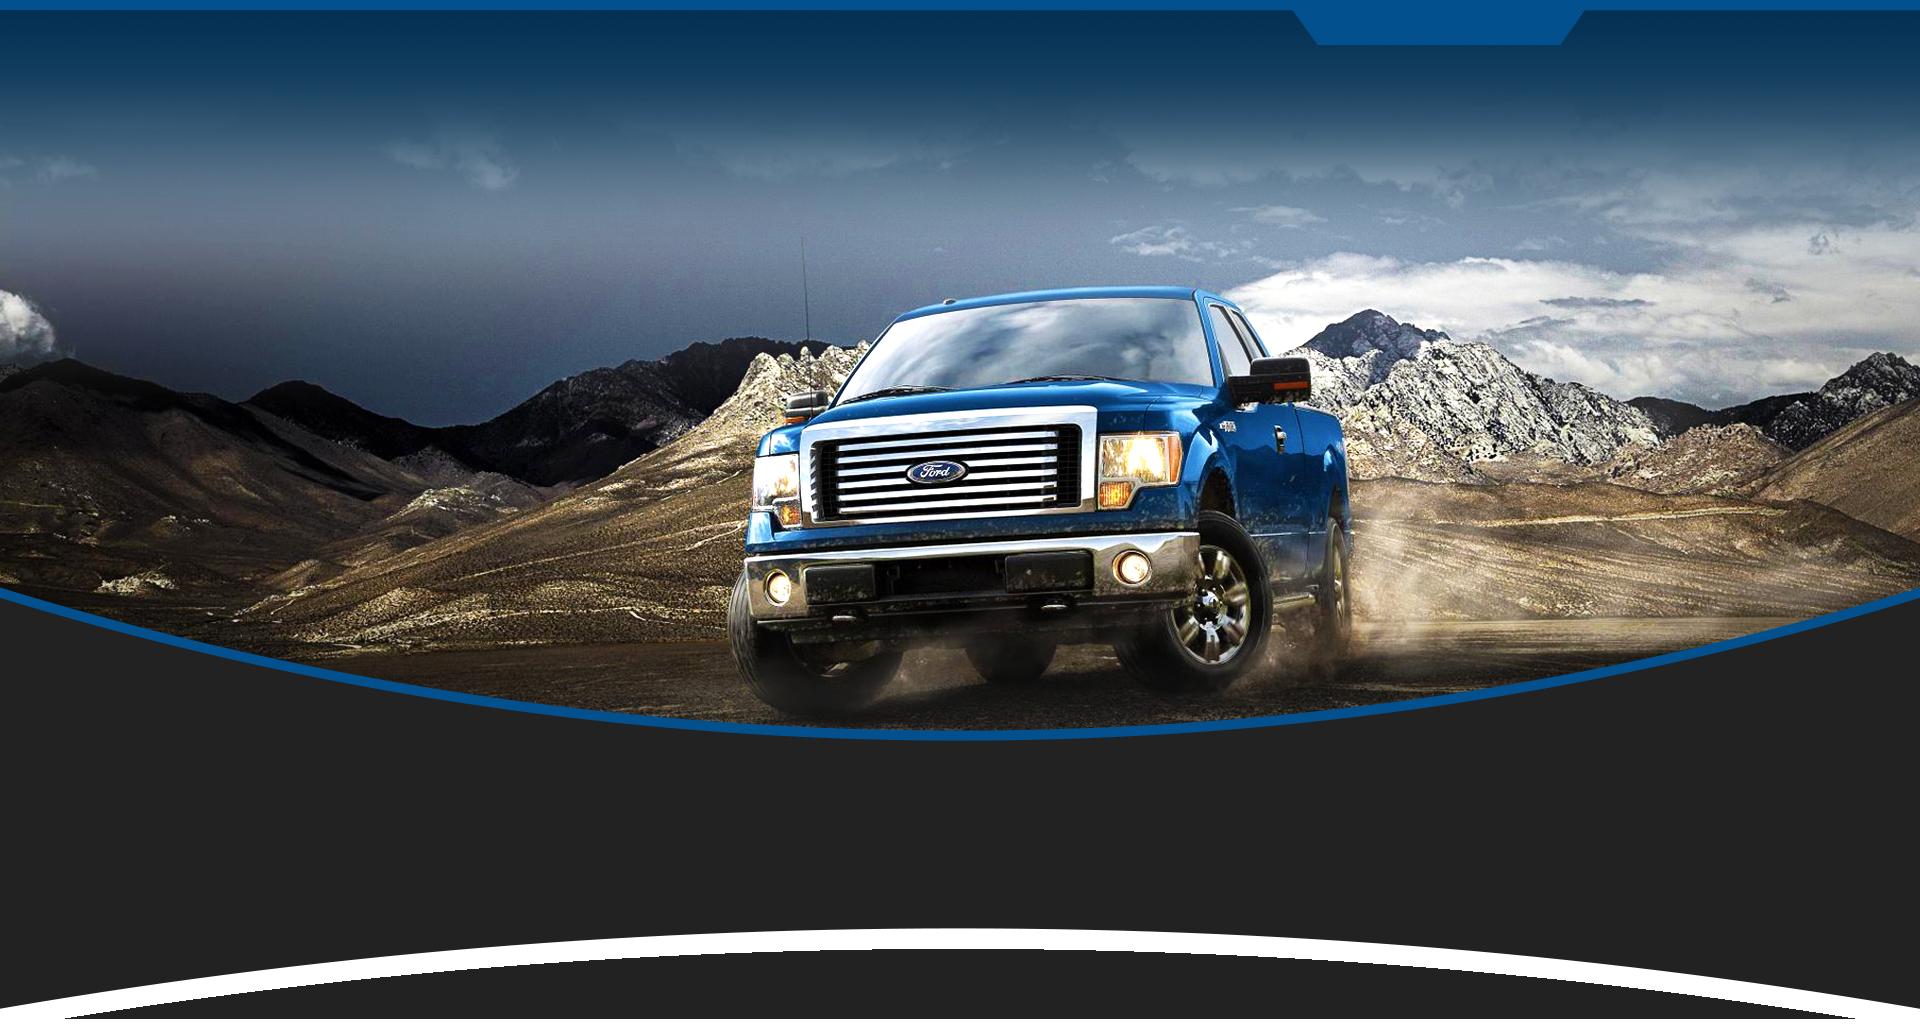 Infiniti Of Lexington >> Empire Auto Sales - Used Cars - Lexington KY Dealer